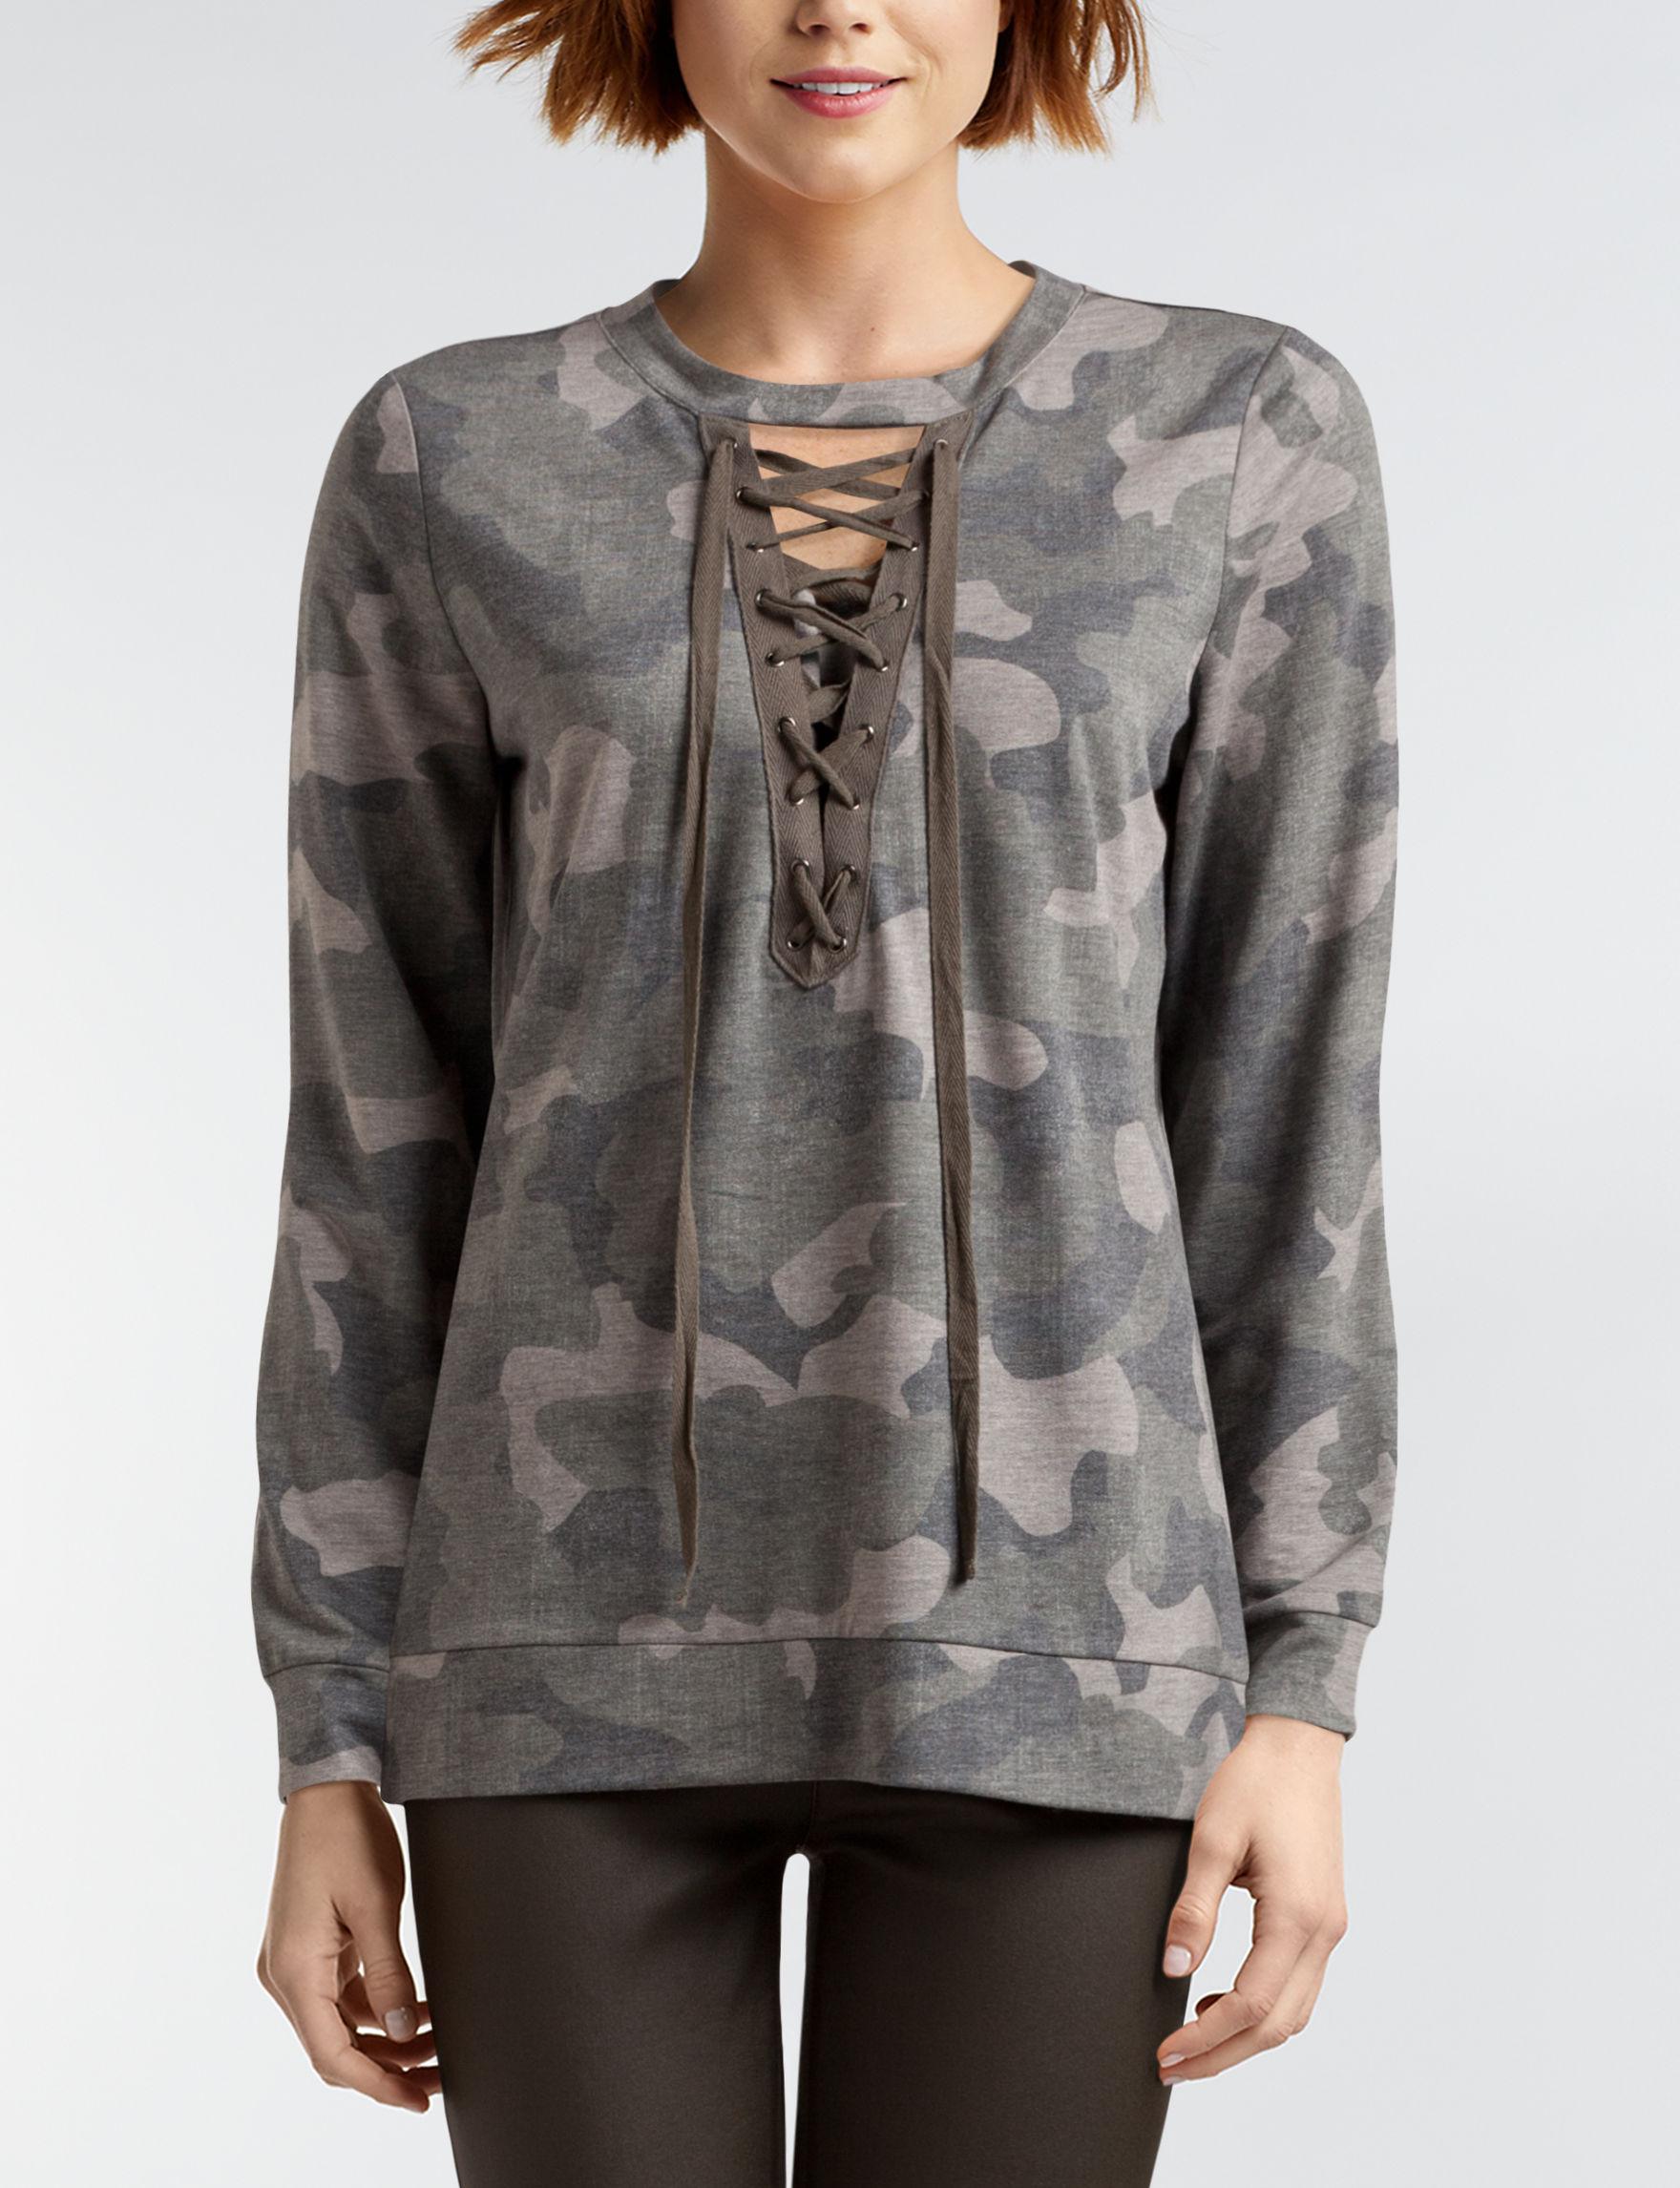 Signature Studio Camo Shirts & Blouses